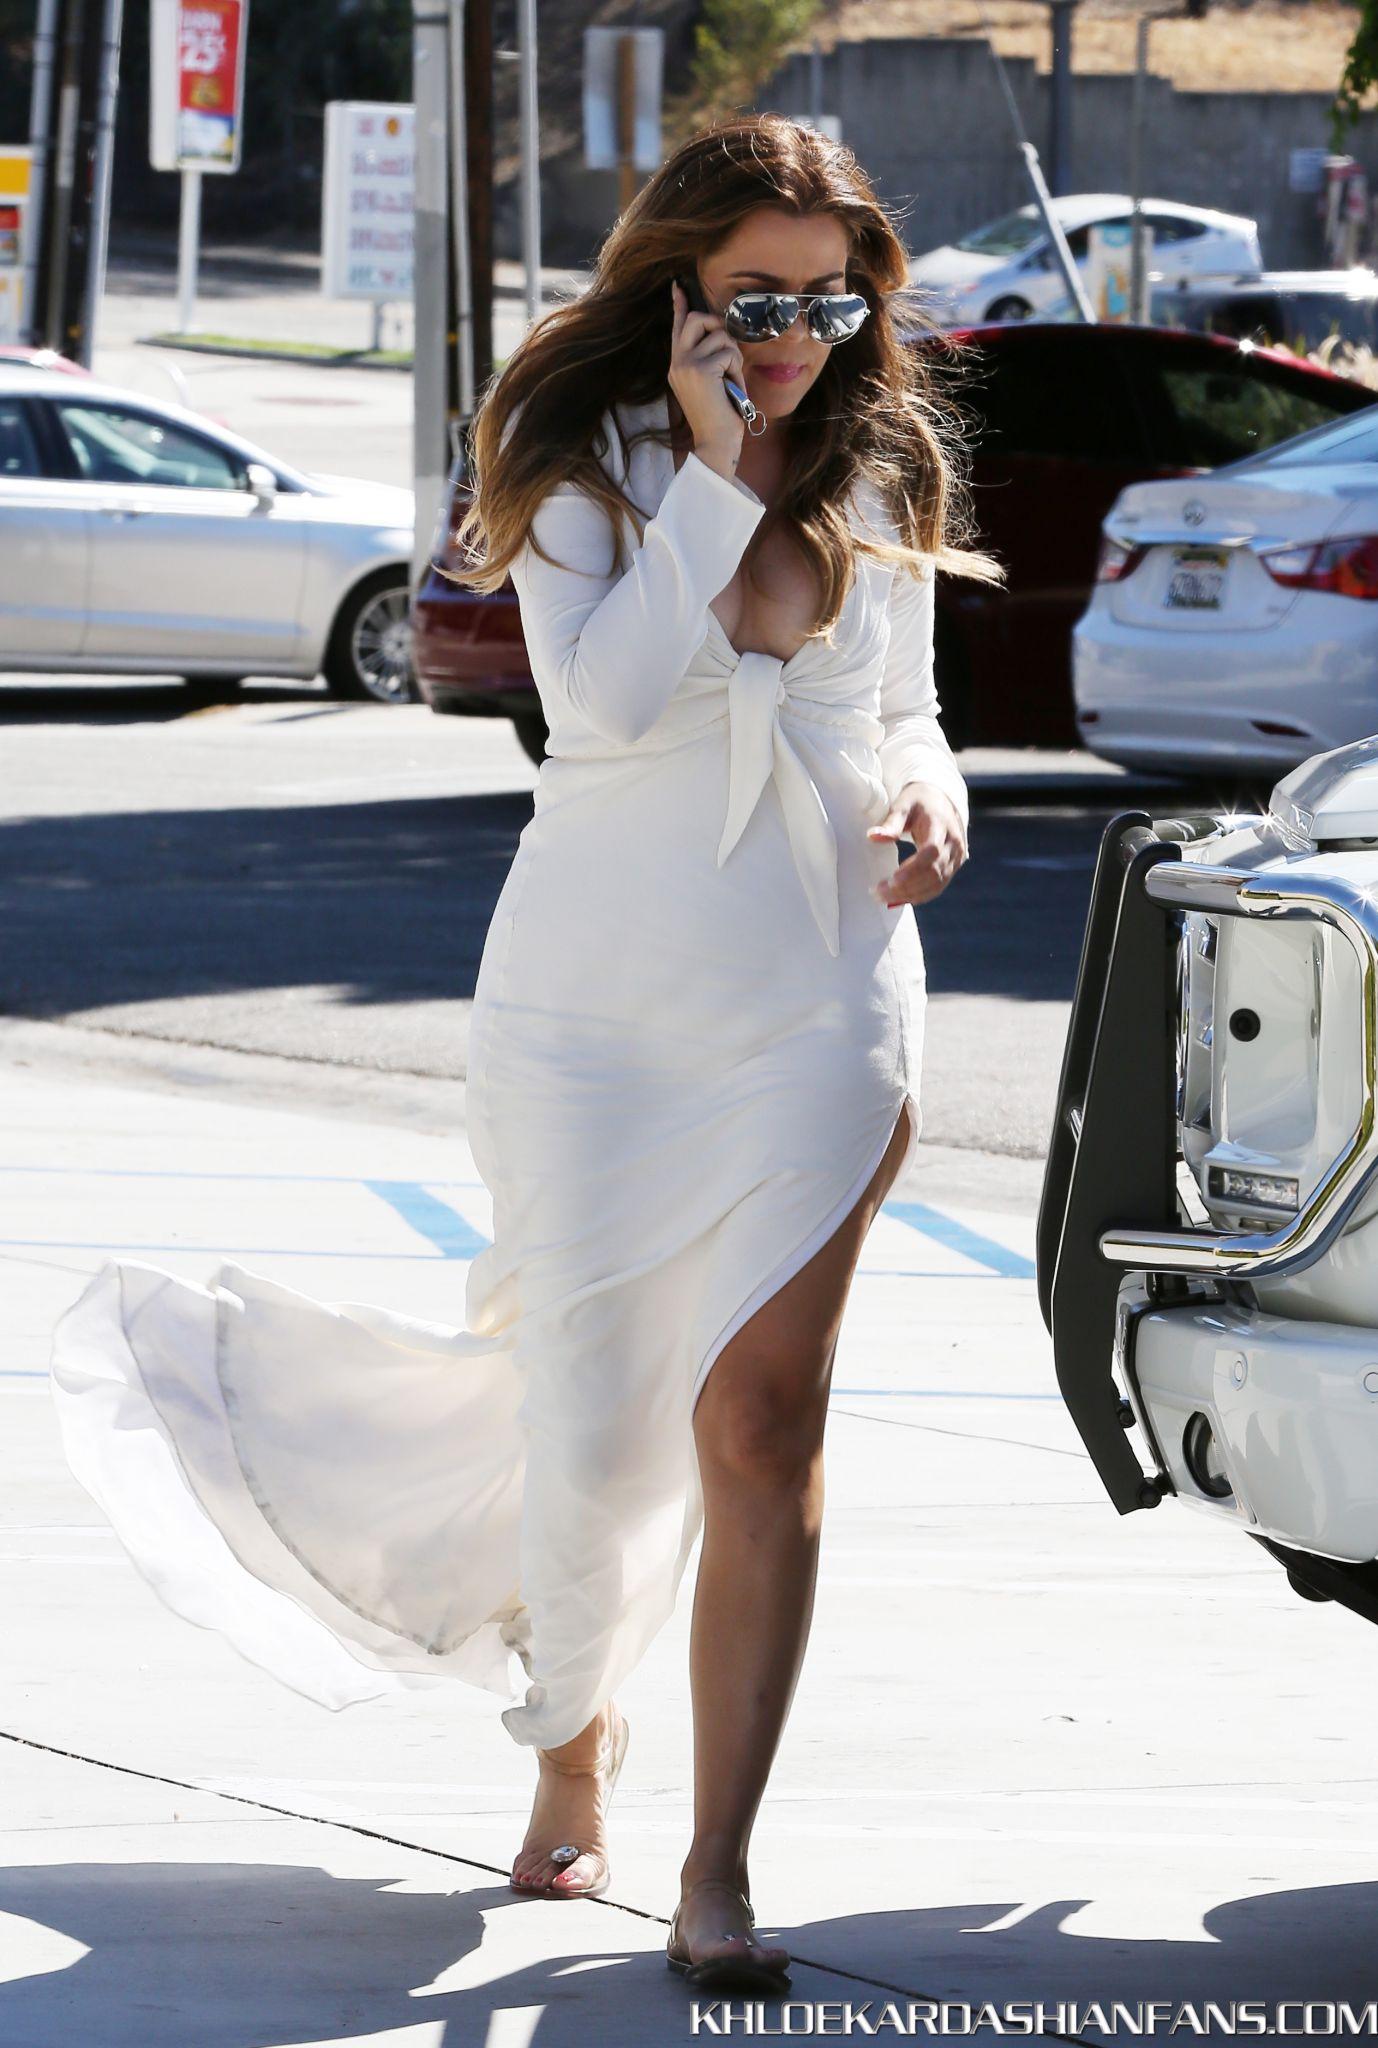 Khloe Kardashian 2014 : Khloe Kardashian in White Dress -09